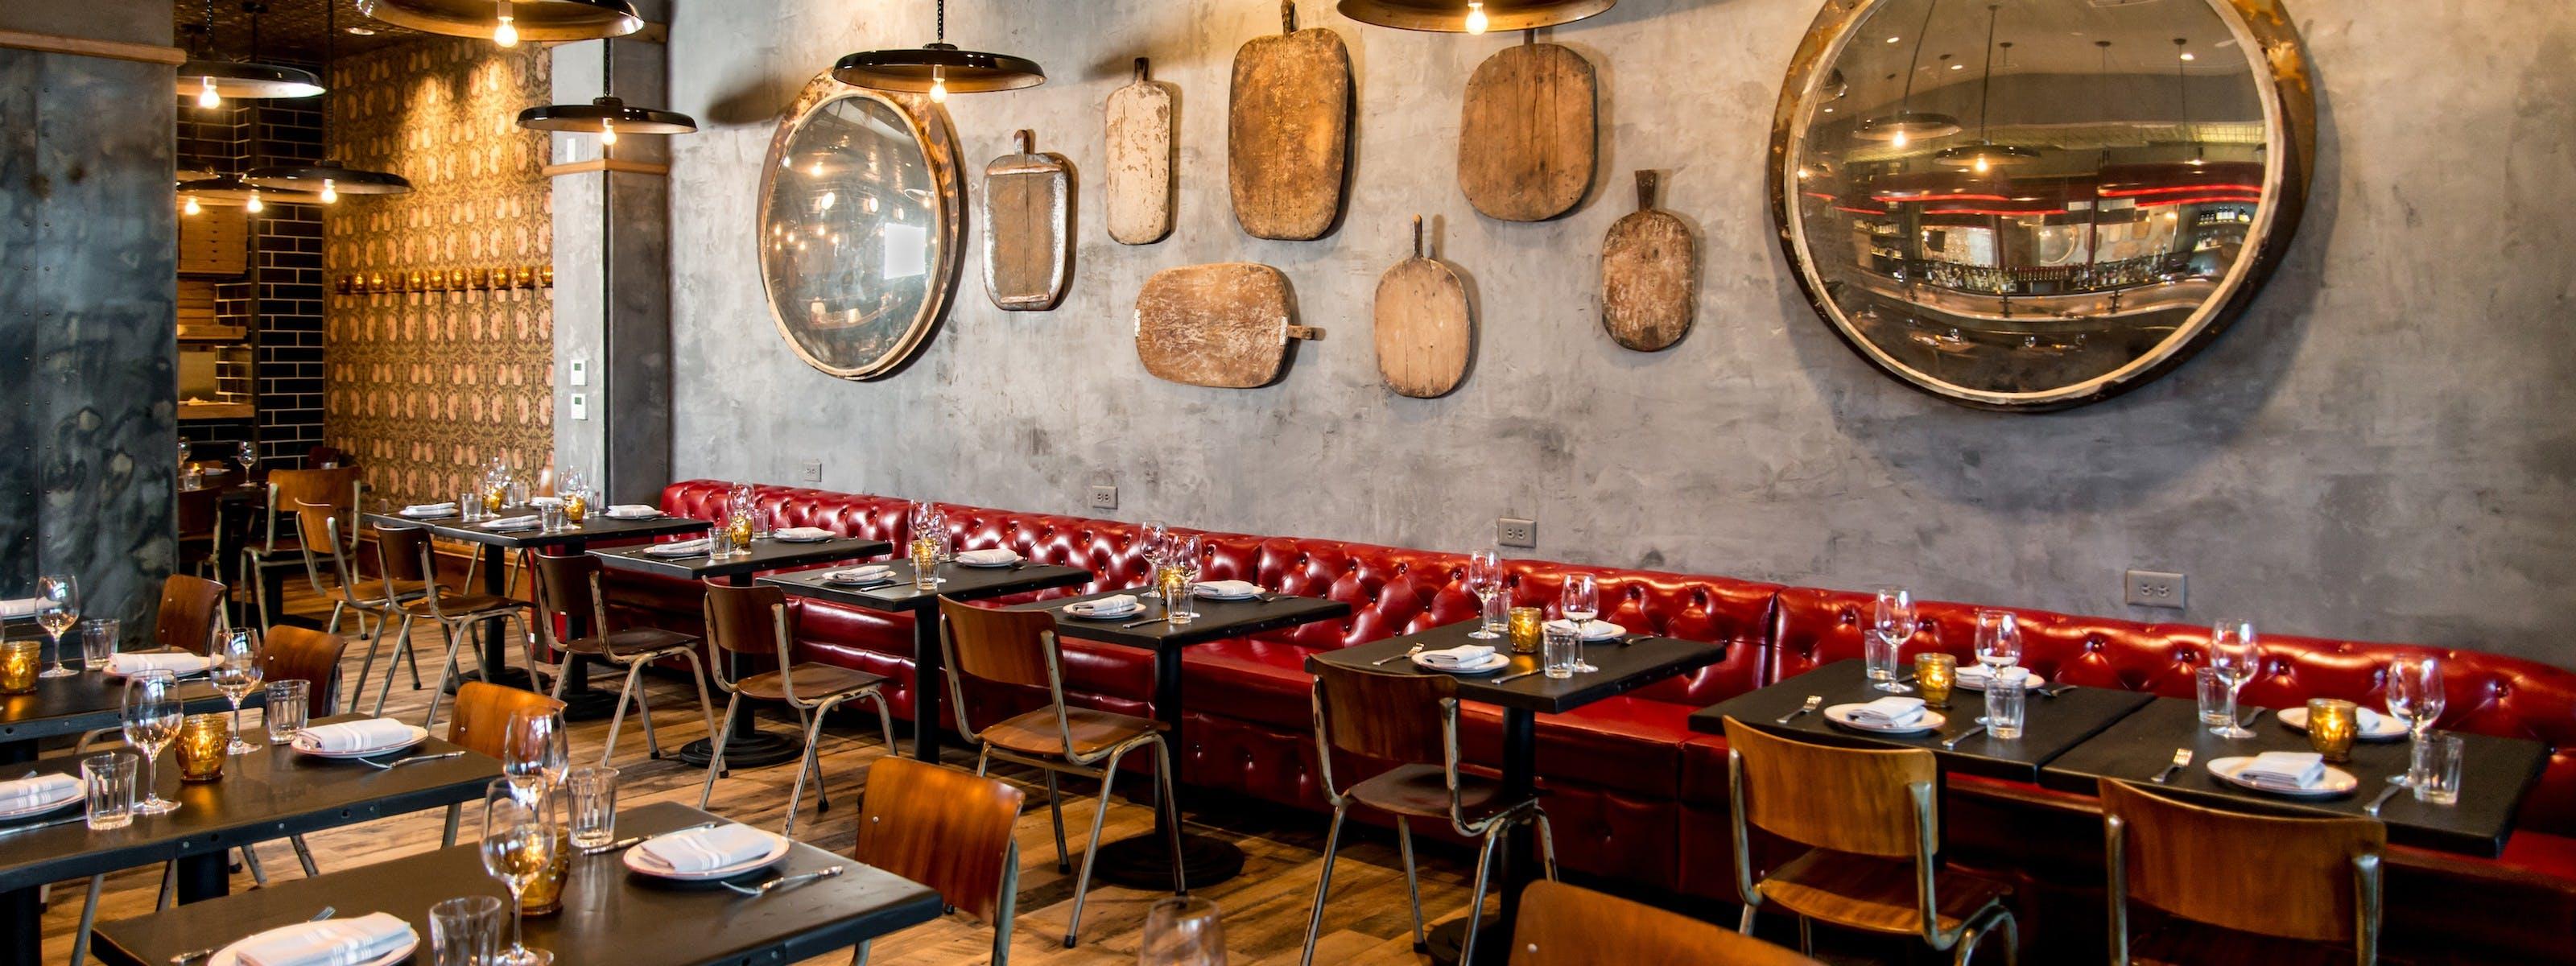 The ATL Hit List: The Best New Restaurants in Atlanta - Atlanta - The Infatuation